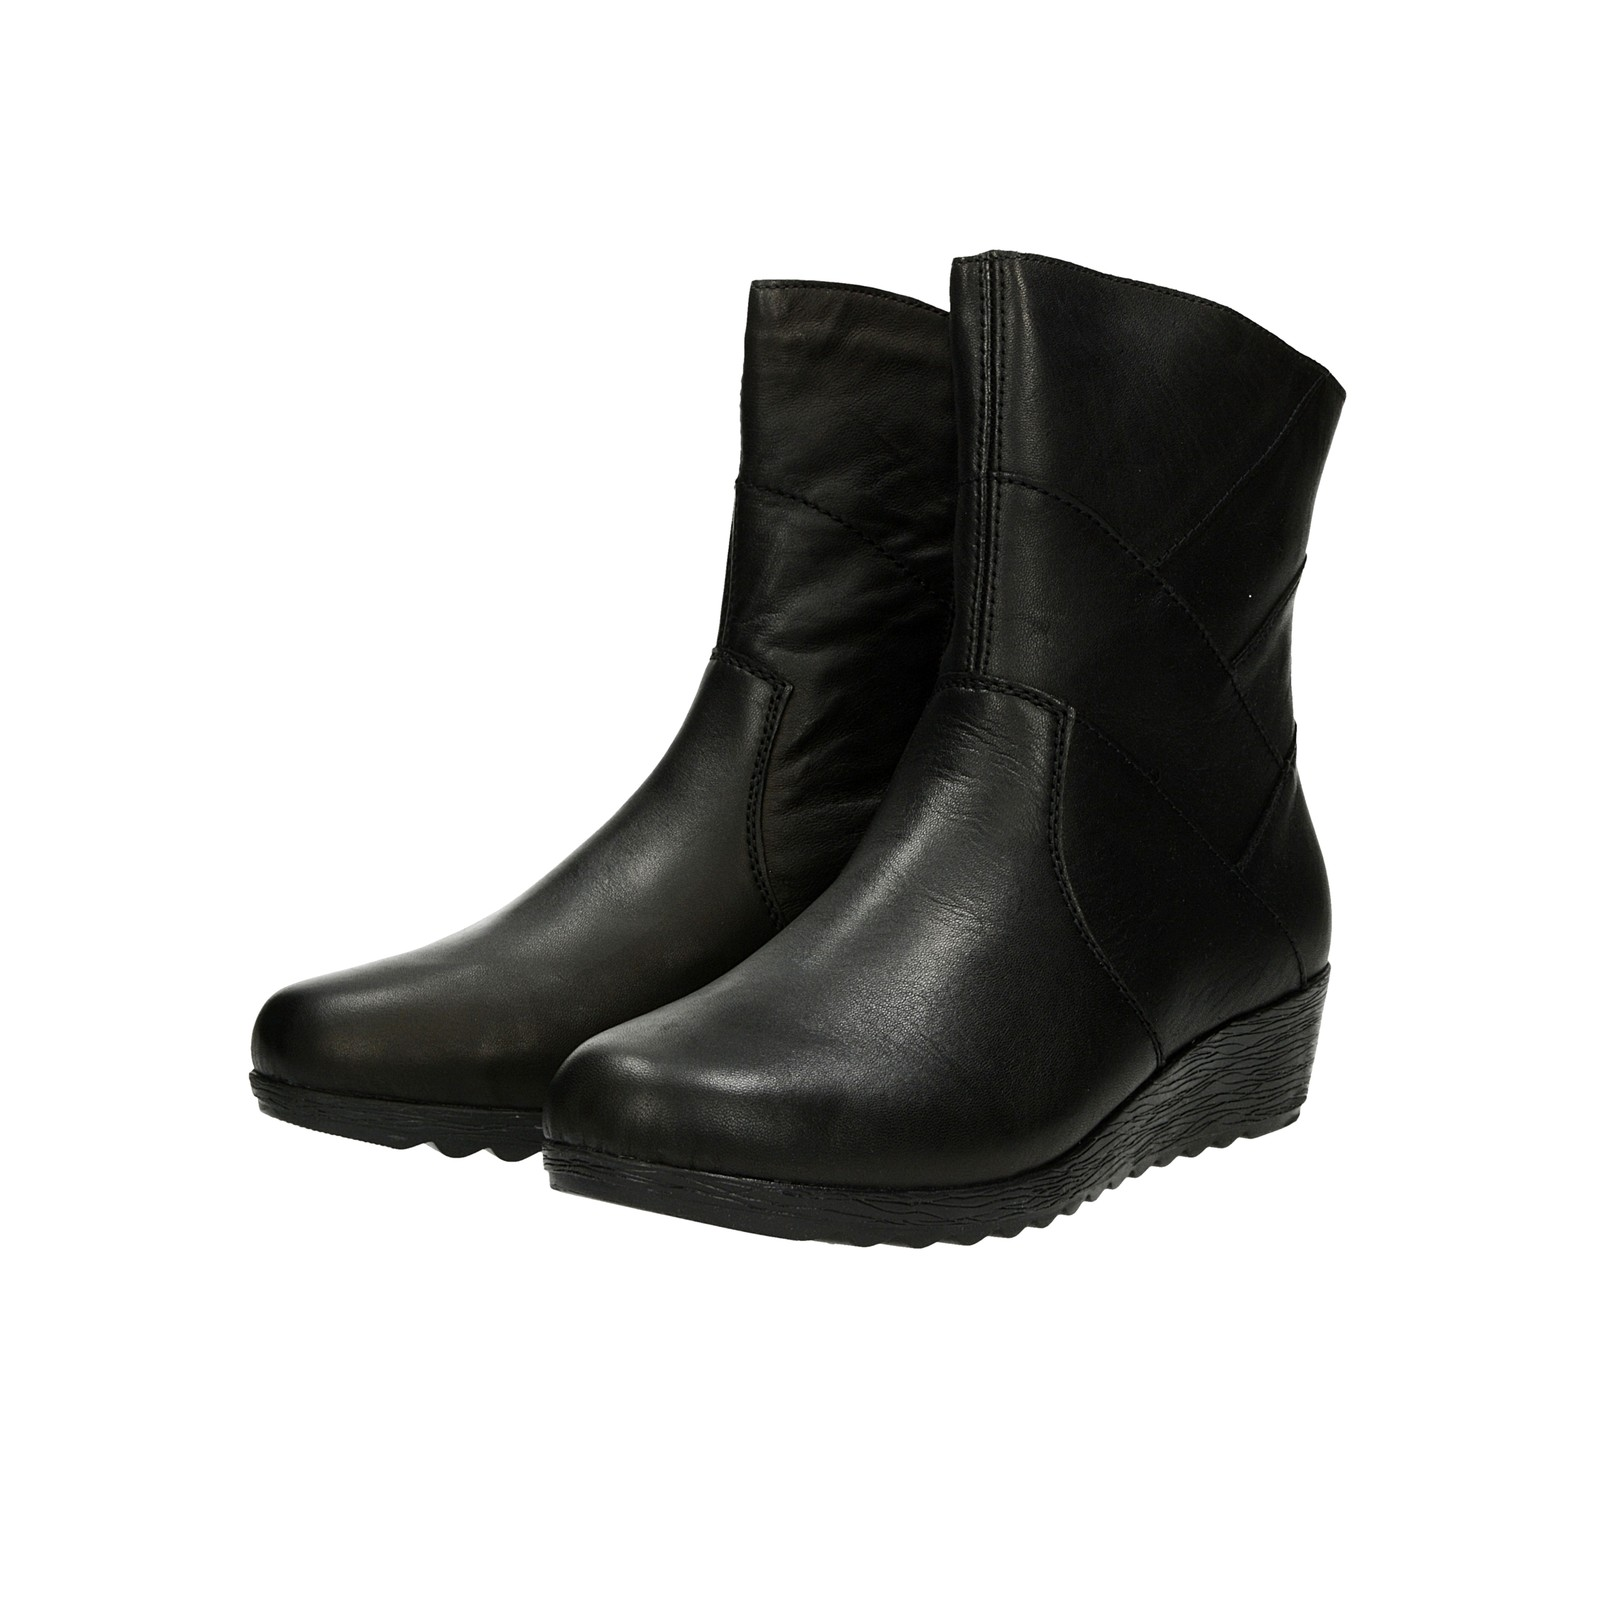 ... Rieker dámske kožené nízke čižmy na zips - čierne ... b45ec15d922